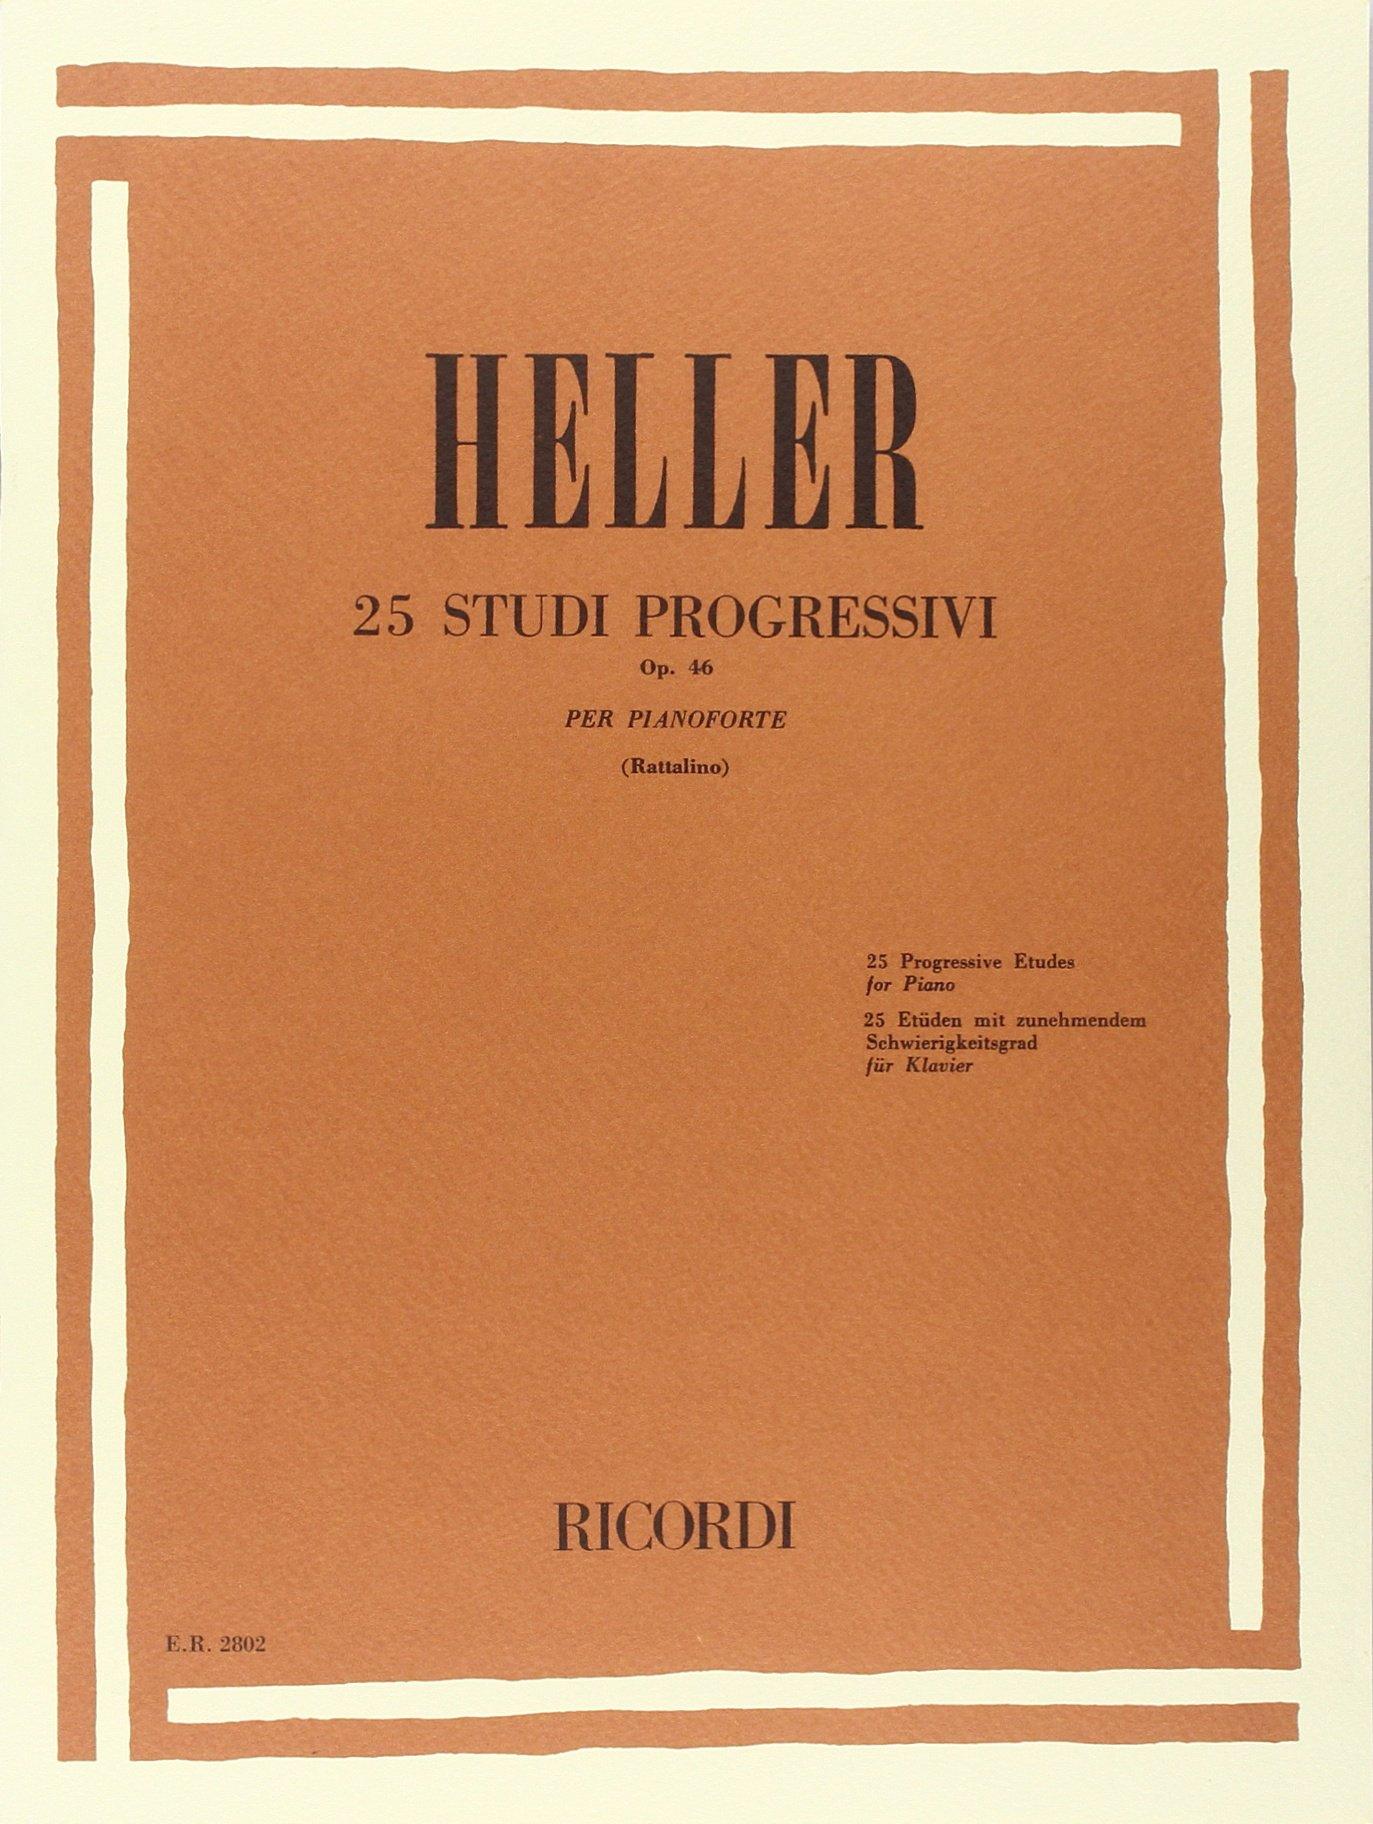 25 STUDI PROGRESSIVI OP. 46 (Francese) Copertina flessibile – 16 mar 1981 HELLER S. Ricordi 004182802X Musique